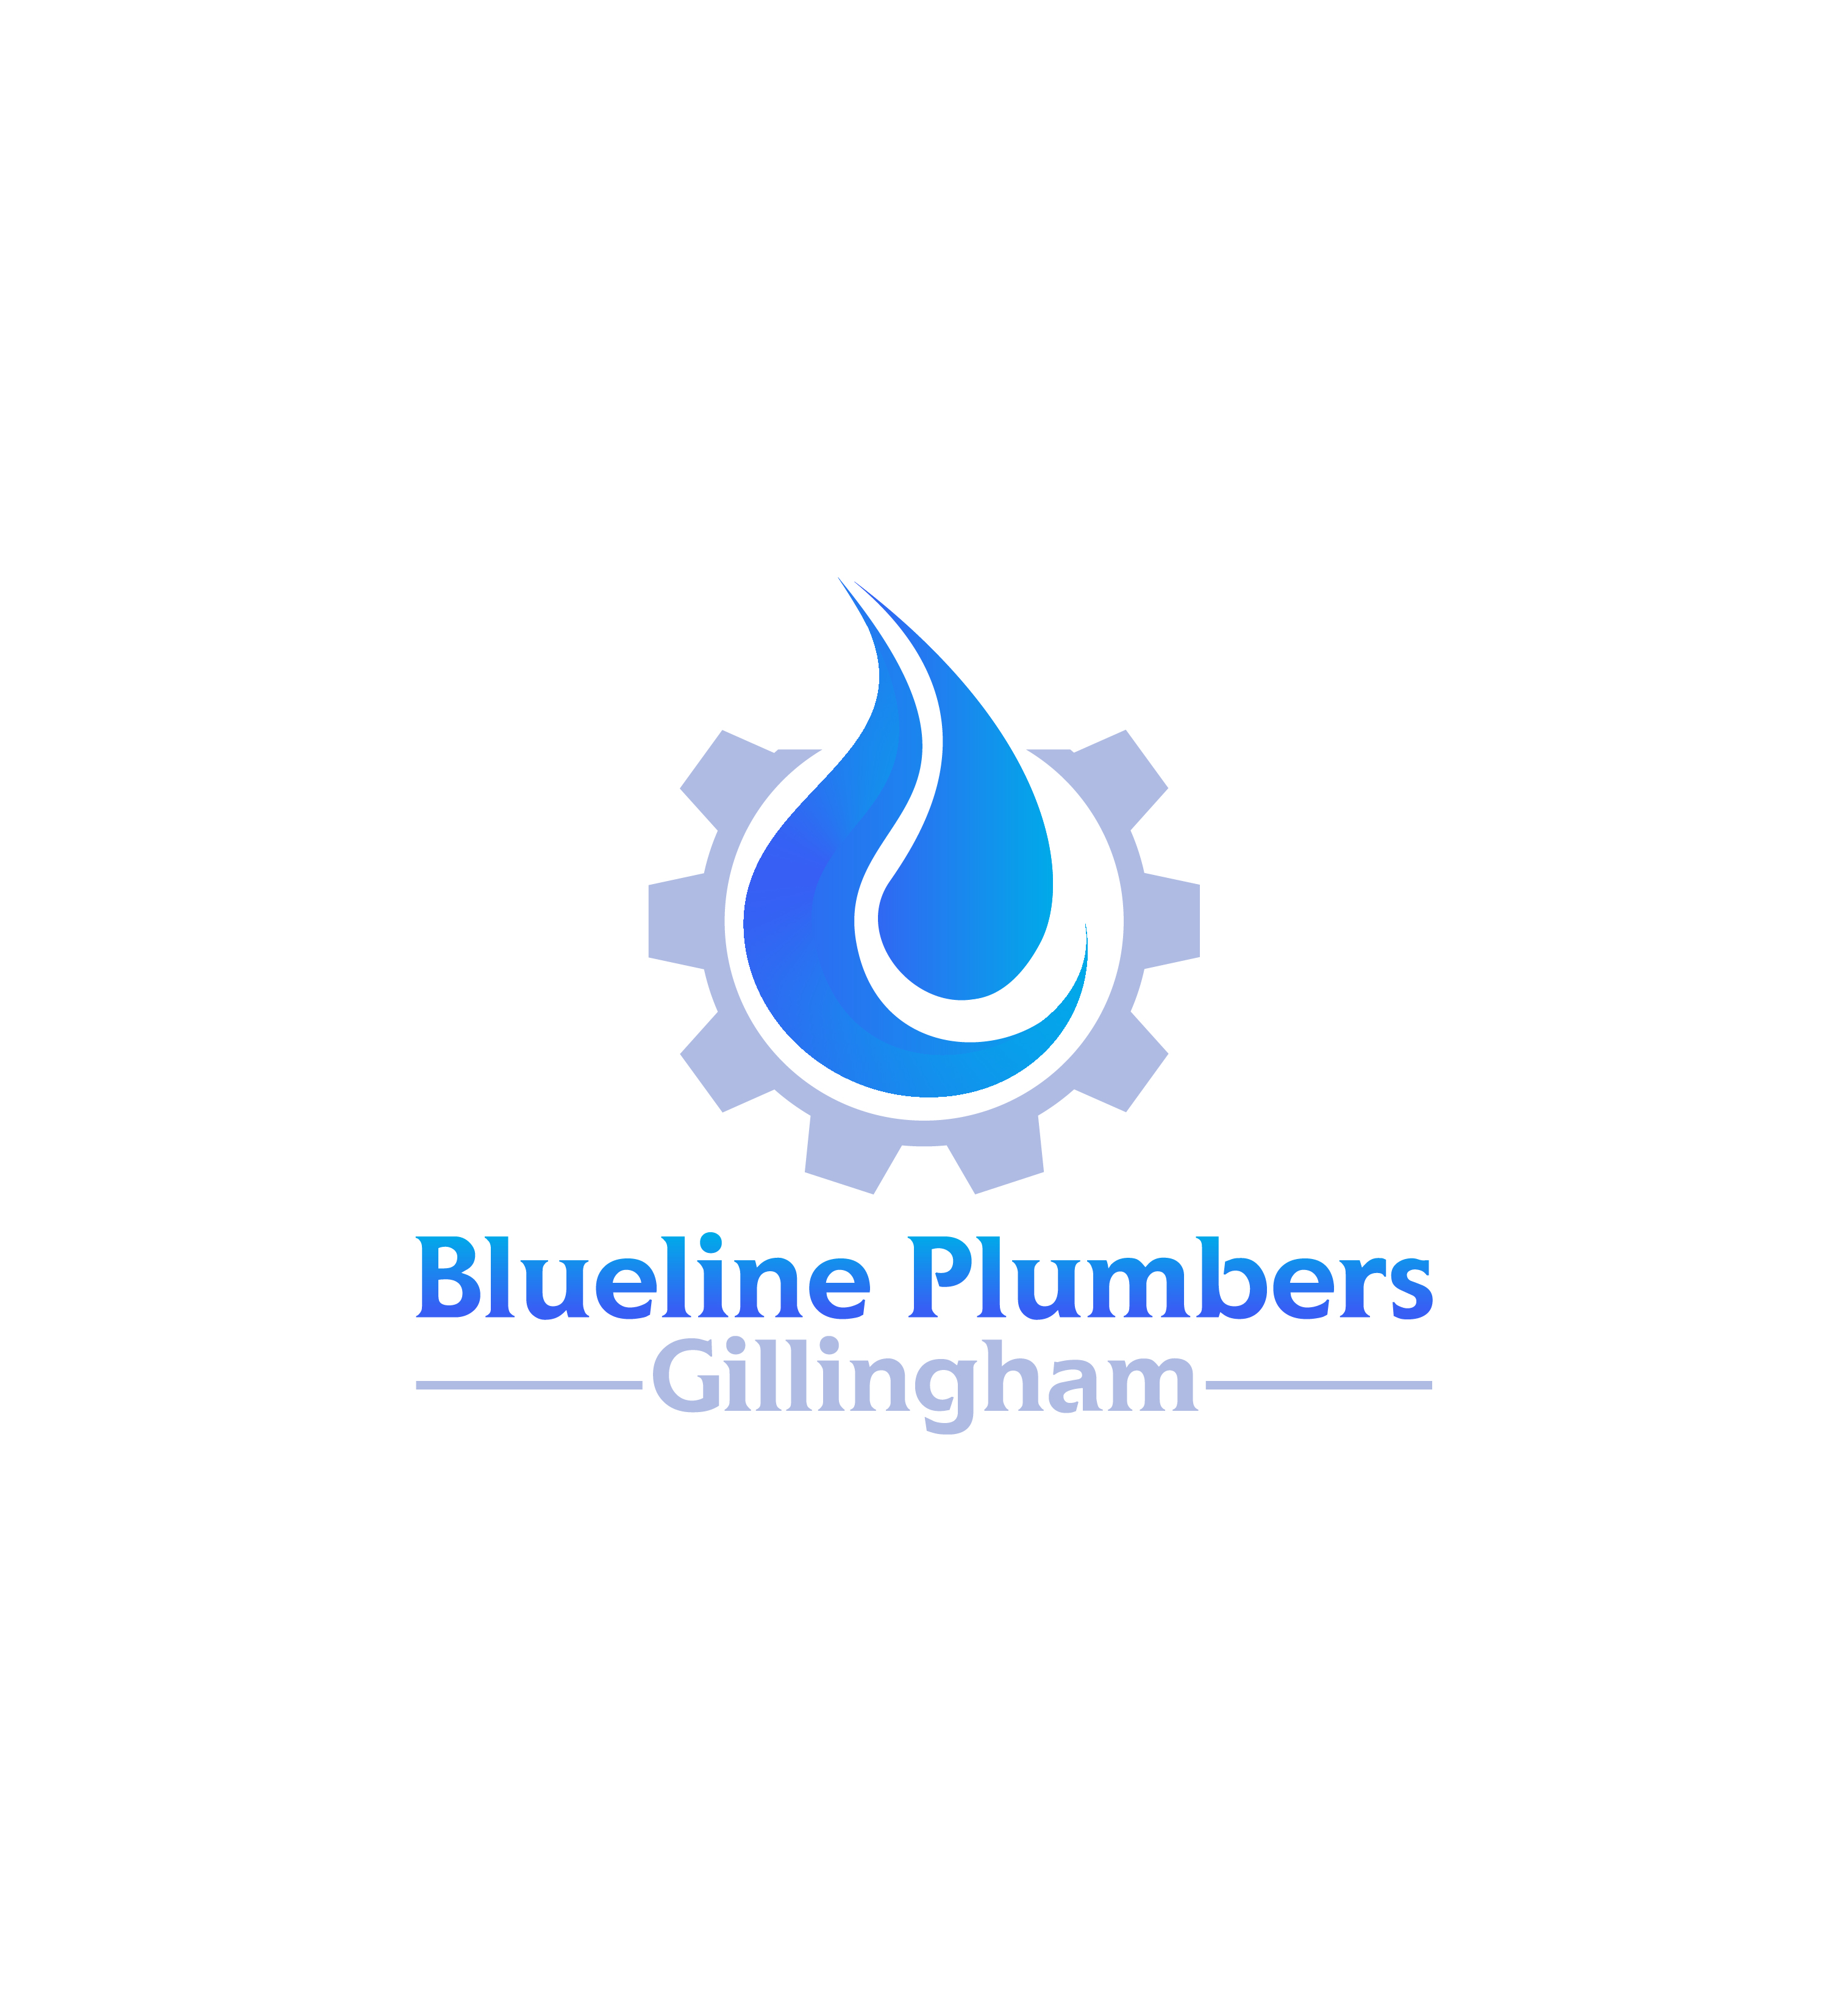 Logo of Blueline Plumbers Gillingham